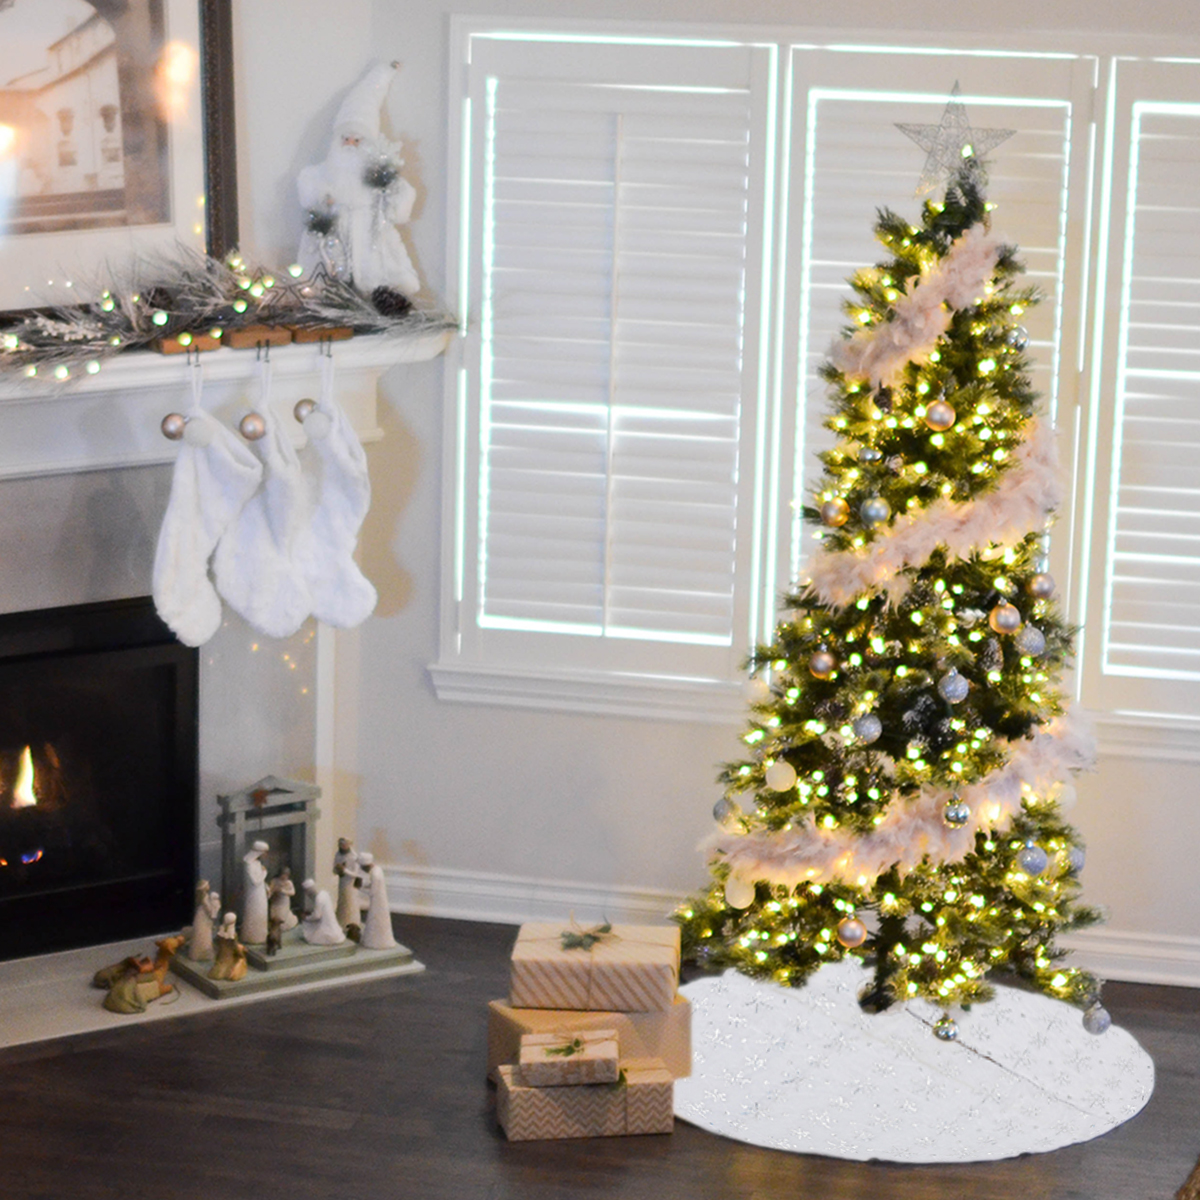 90/120cm Christmas Tree Skirt Tree Skirt Mat Under The Tree Christmas Decorations for Home Snowflake 2020 Christmas Tree Foot Carpet